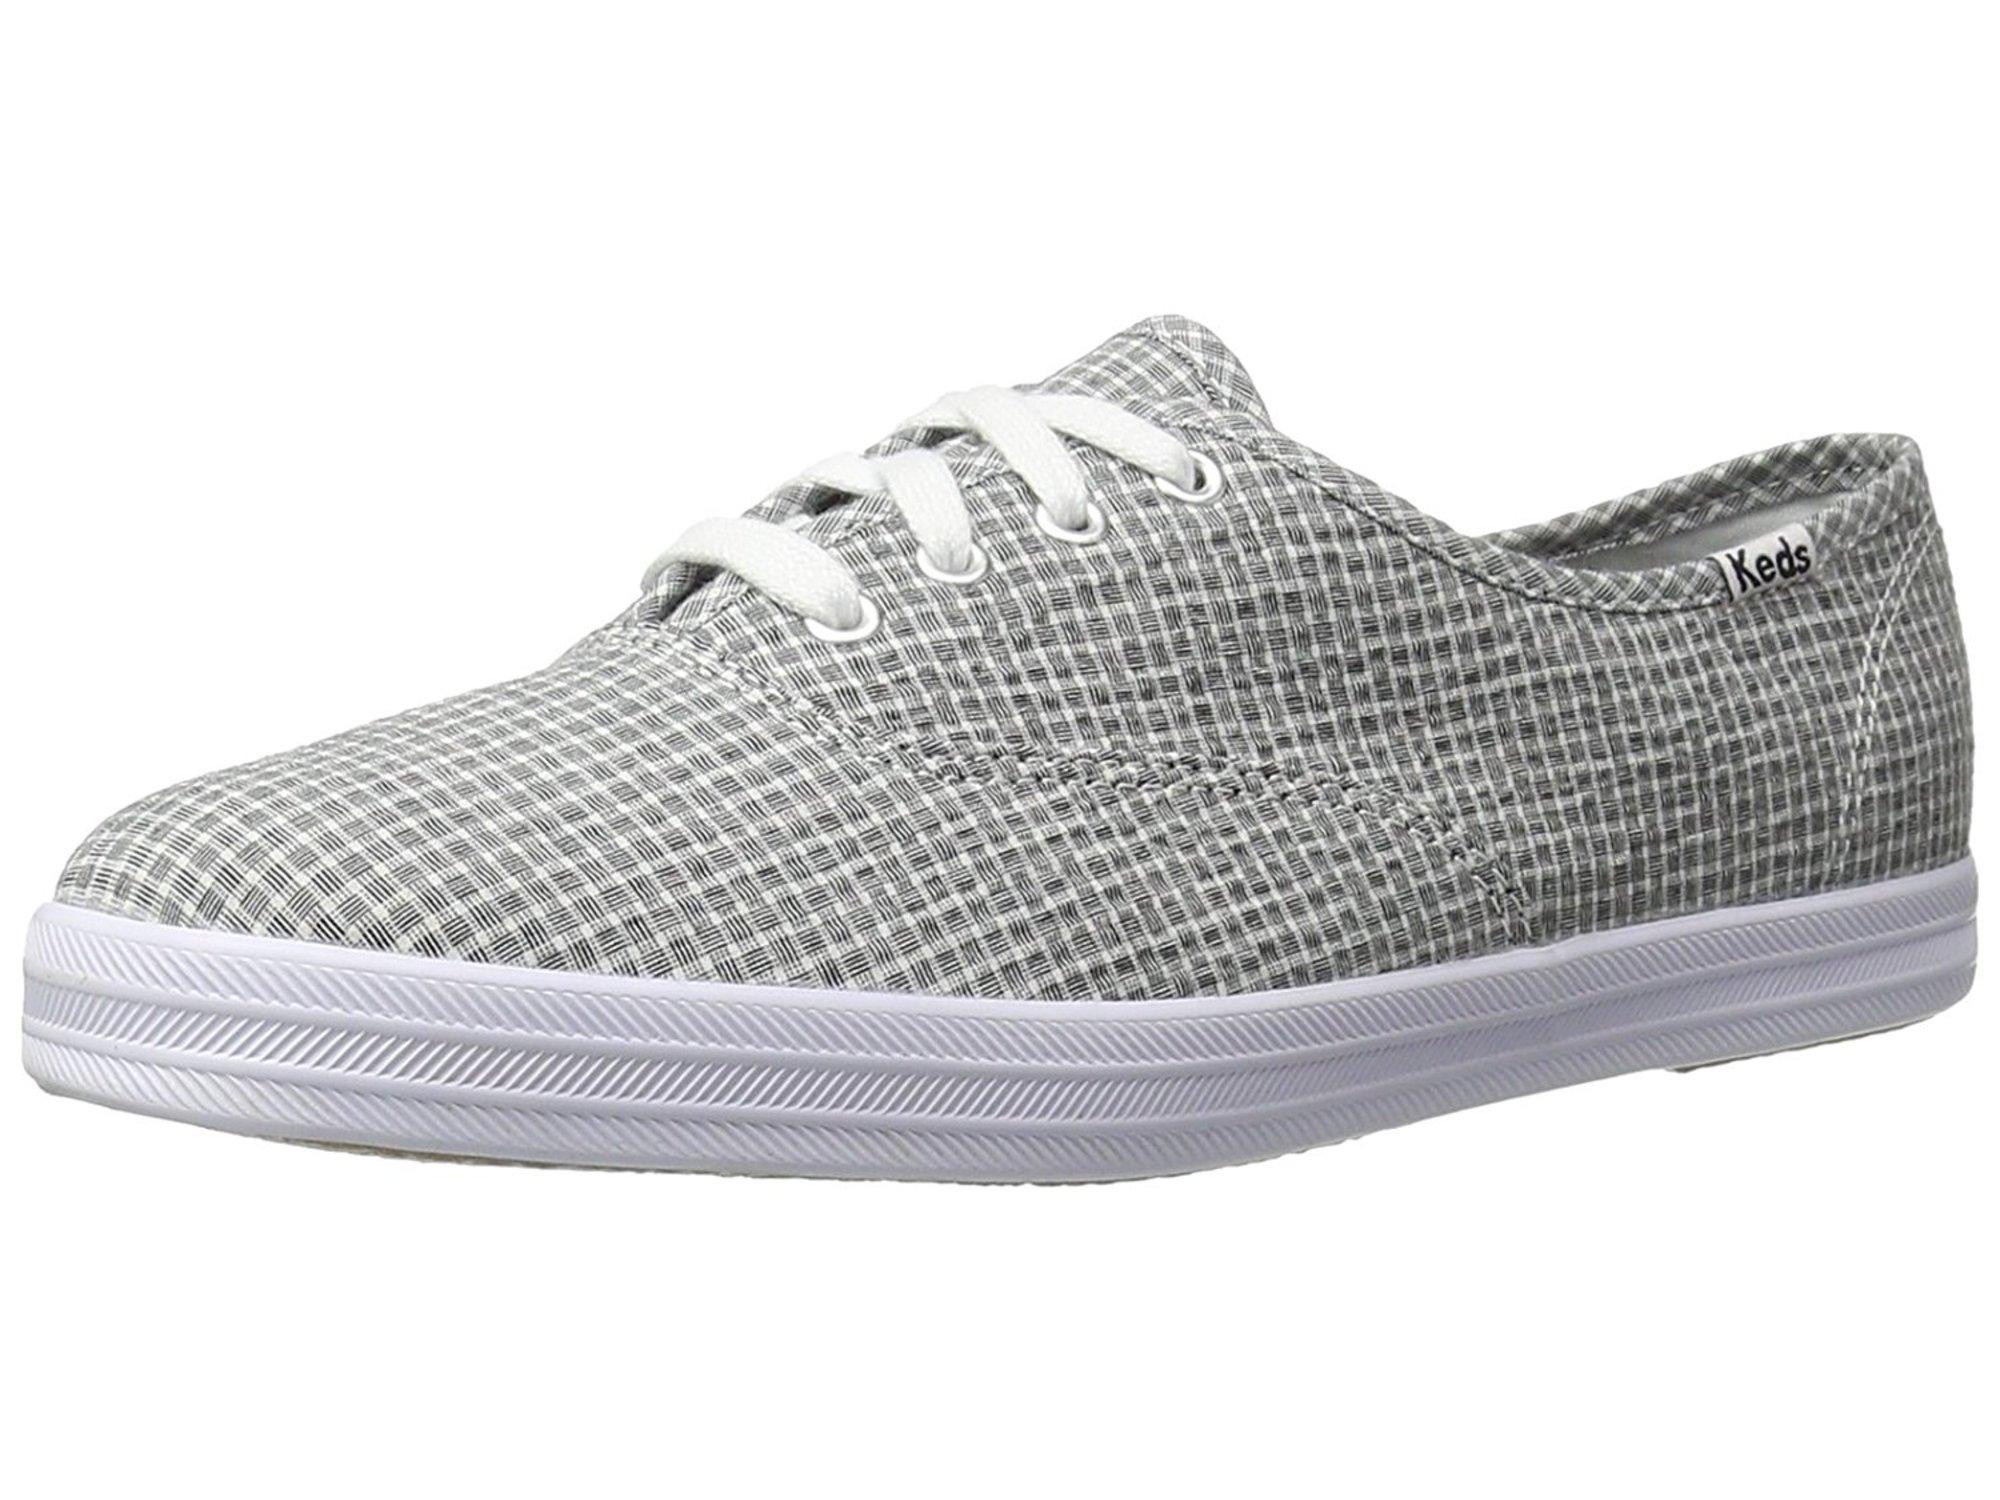 5fcc24ad778 Keds Womens Fashion Sneakers